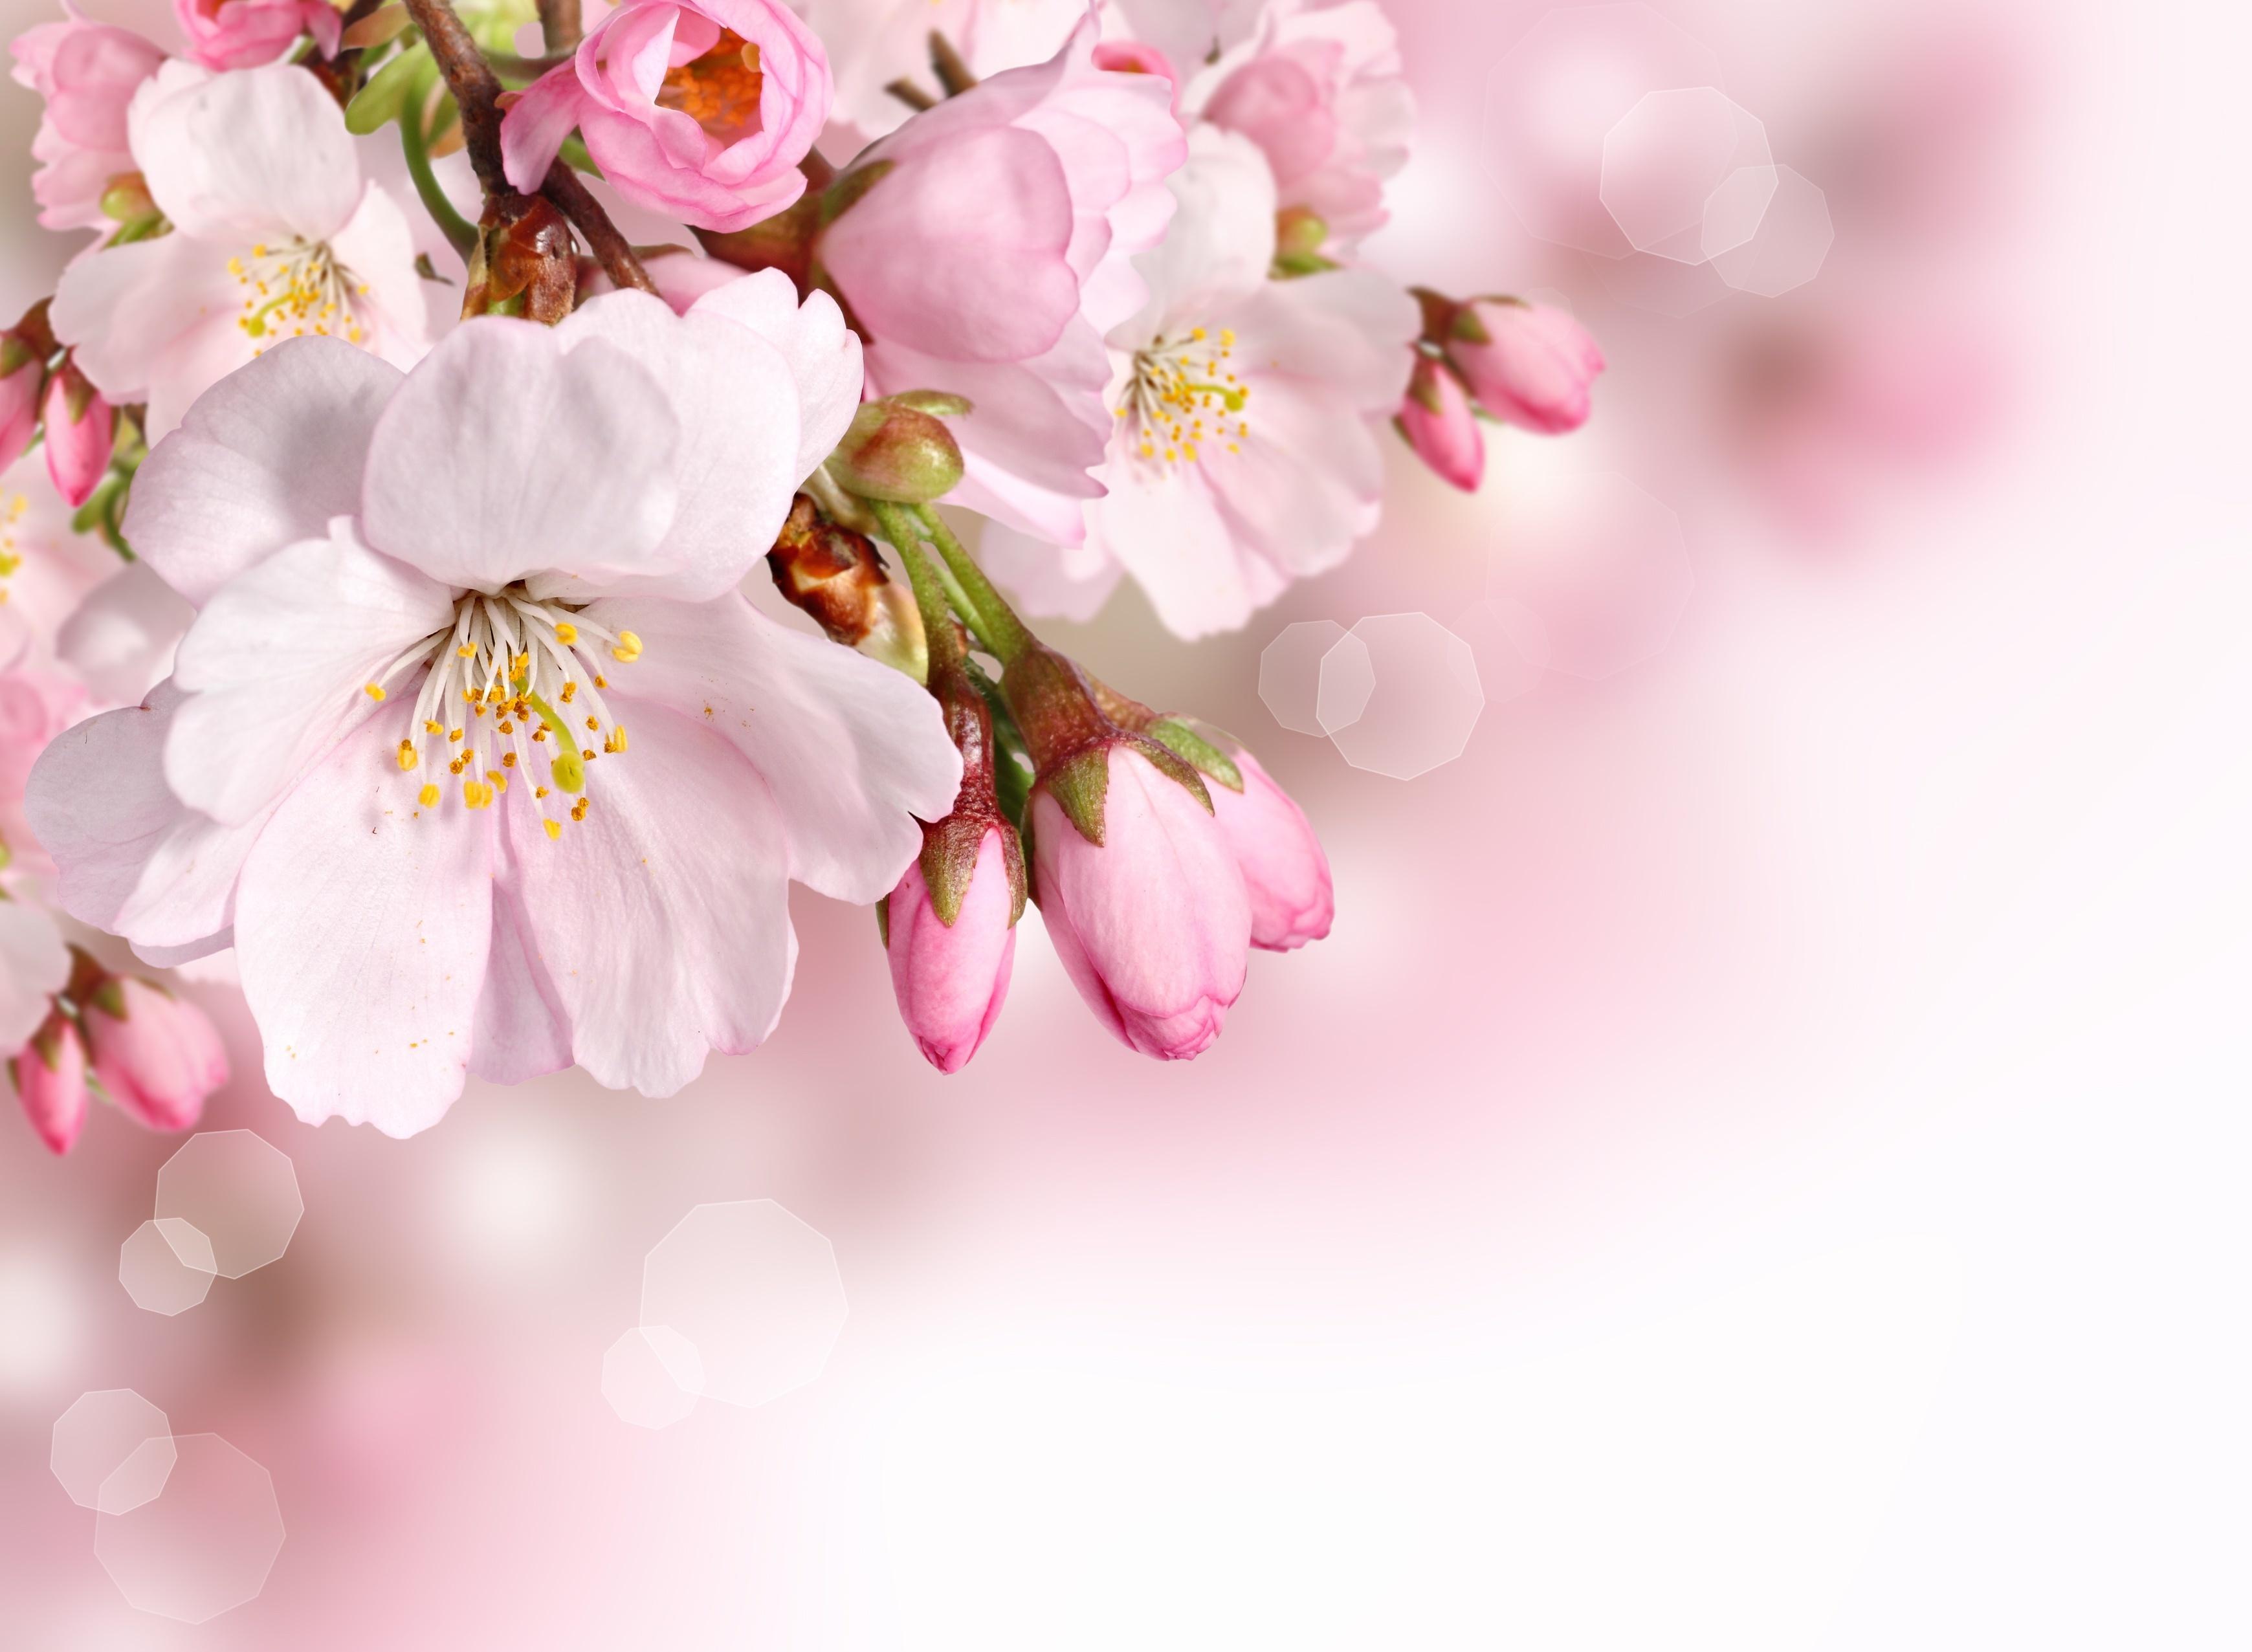 Close Up Flower Nature Pink Flower Spring 3480x2553